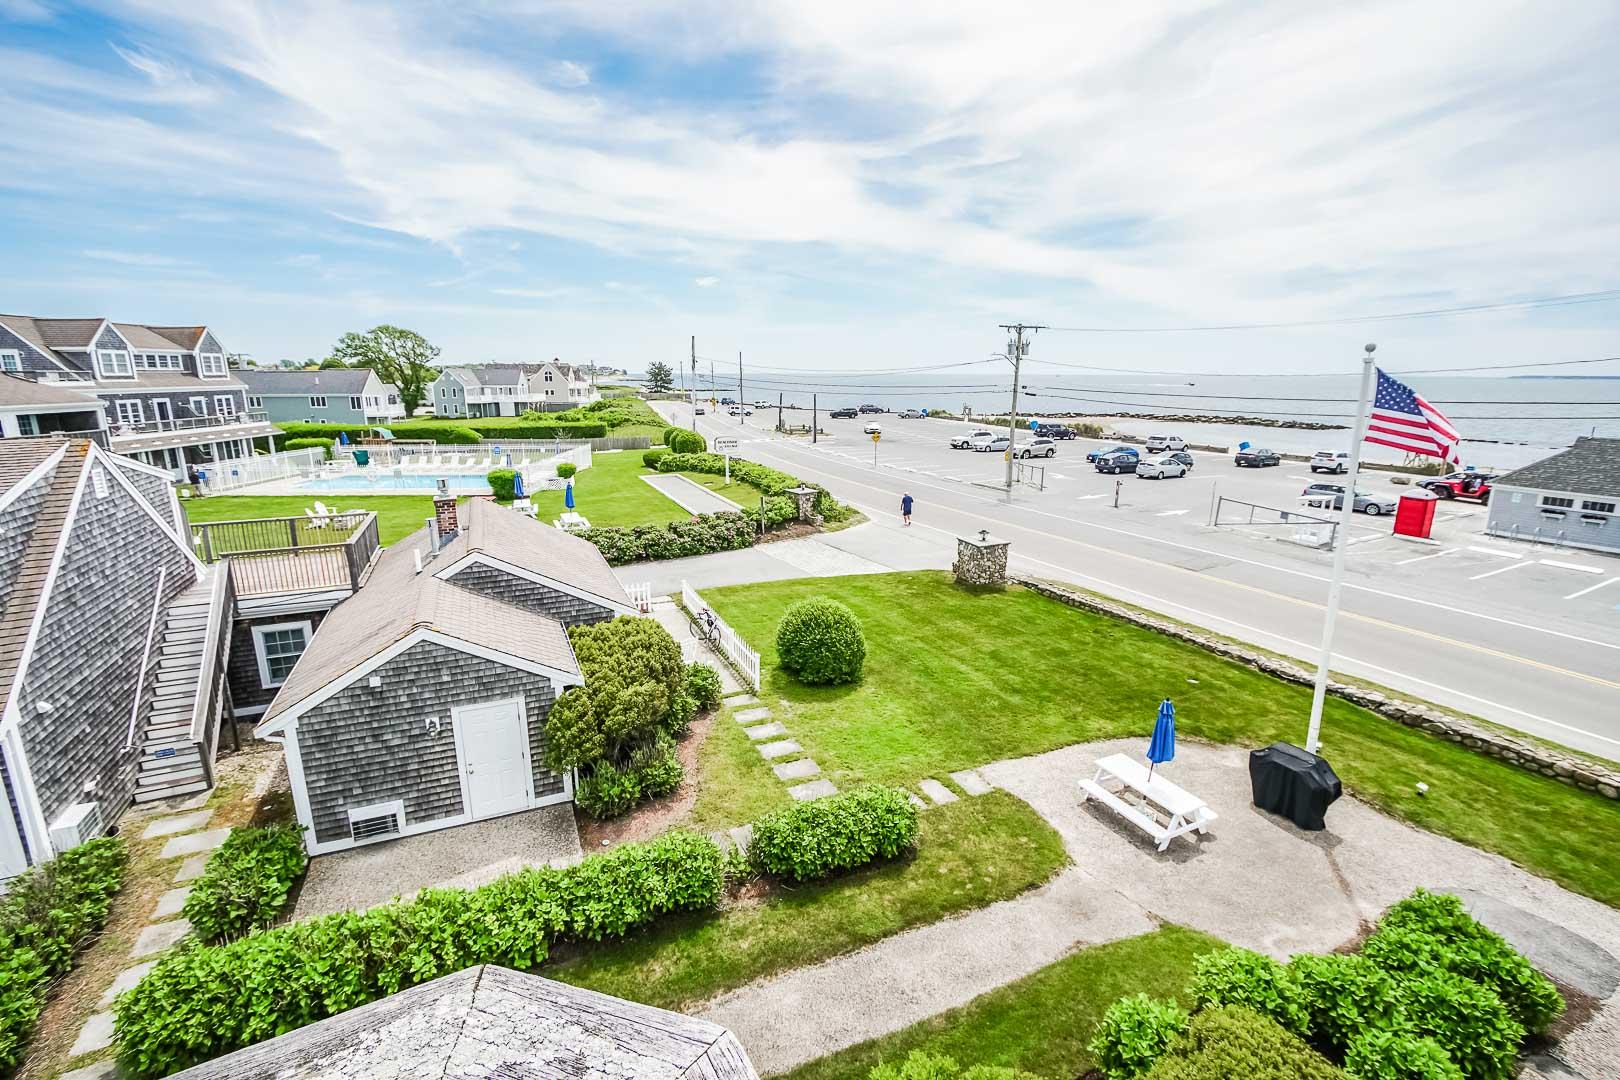 A colonial resort view at VRI's Beachside Village Resort in Massachusetts.